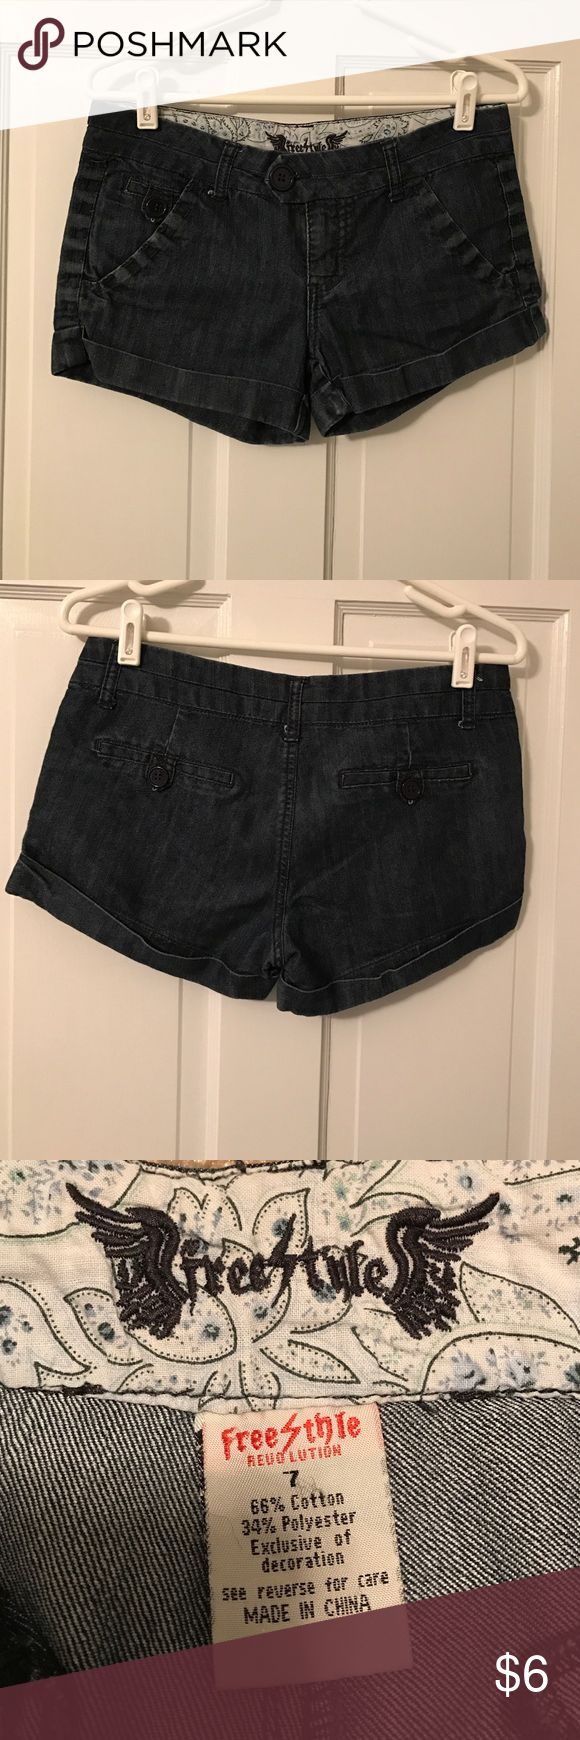 "Juniors shorts Soft denim shorts size 7 juniors.  2"" inseam. Freestyle Shorts"